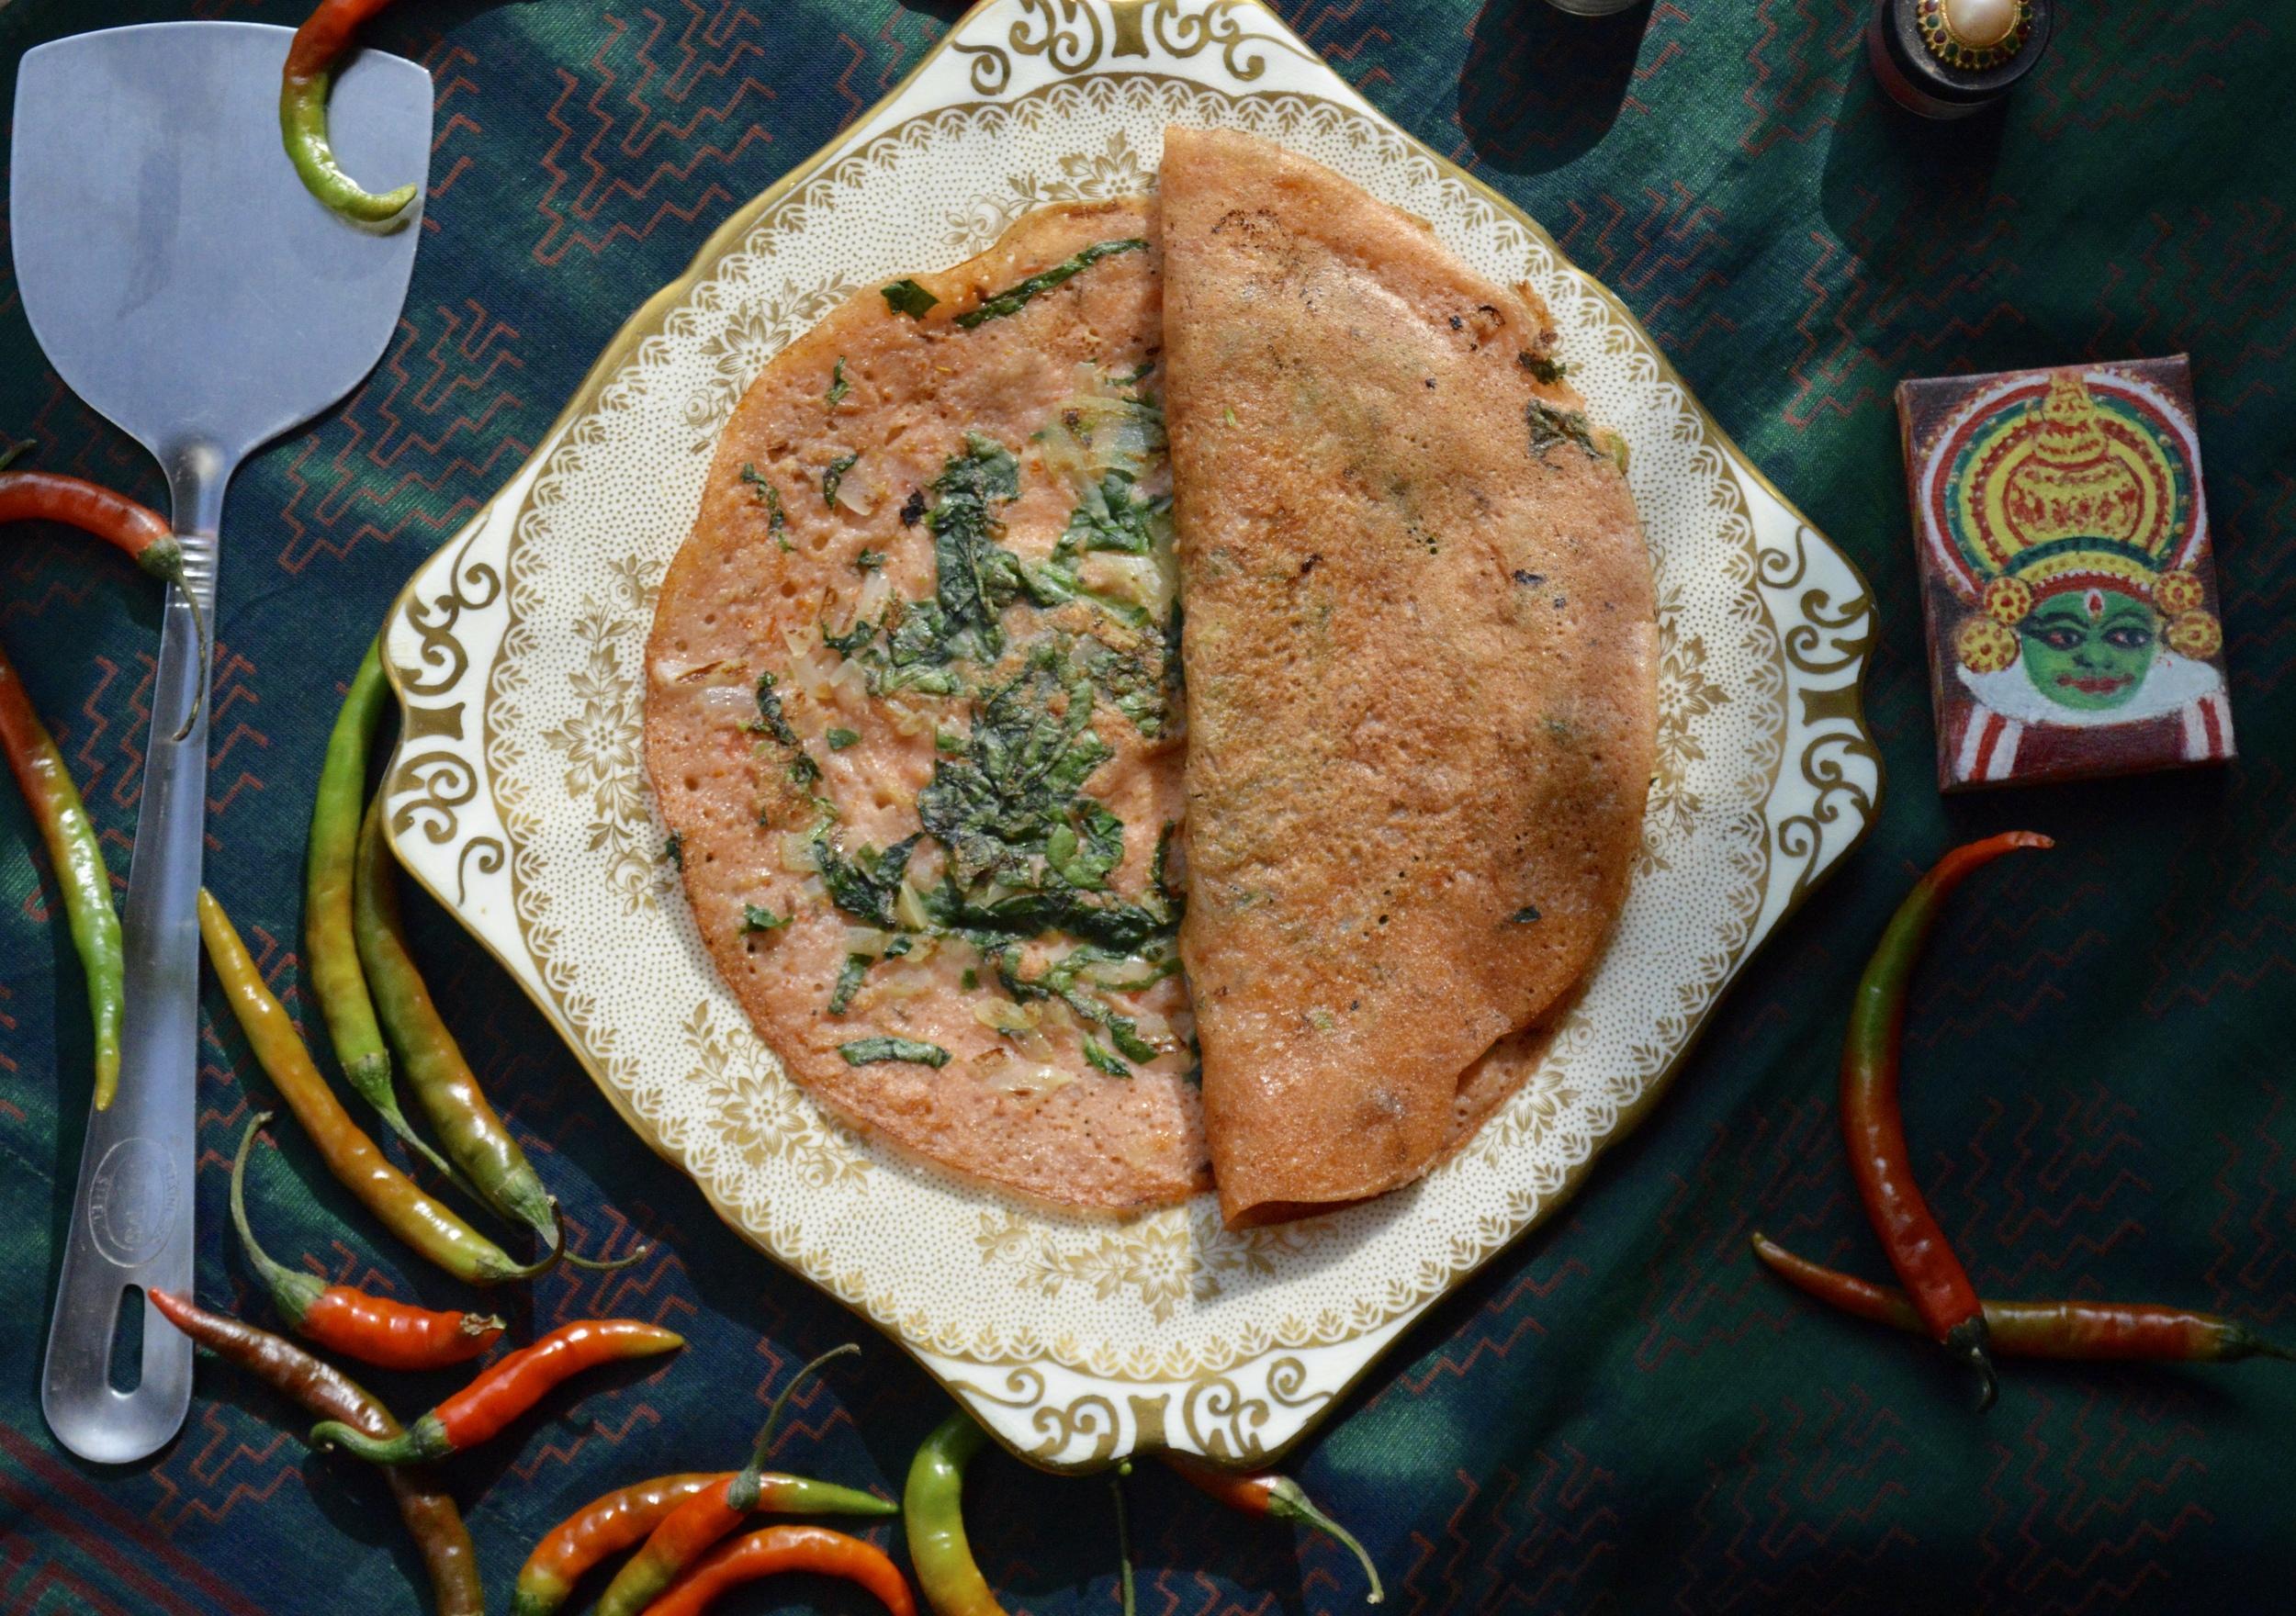 tomato dosa, onelifetwoways, vegan, south indian food blog